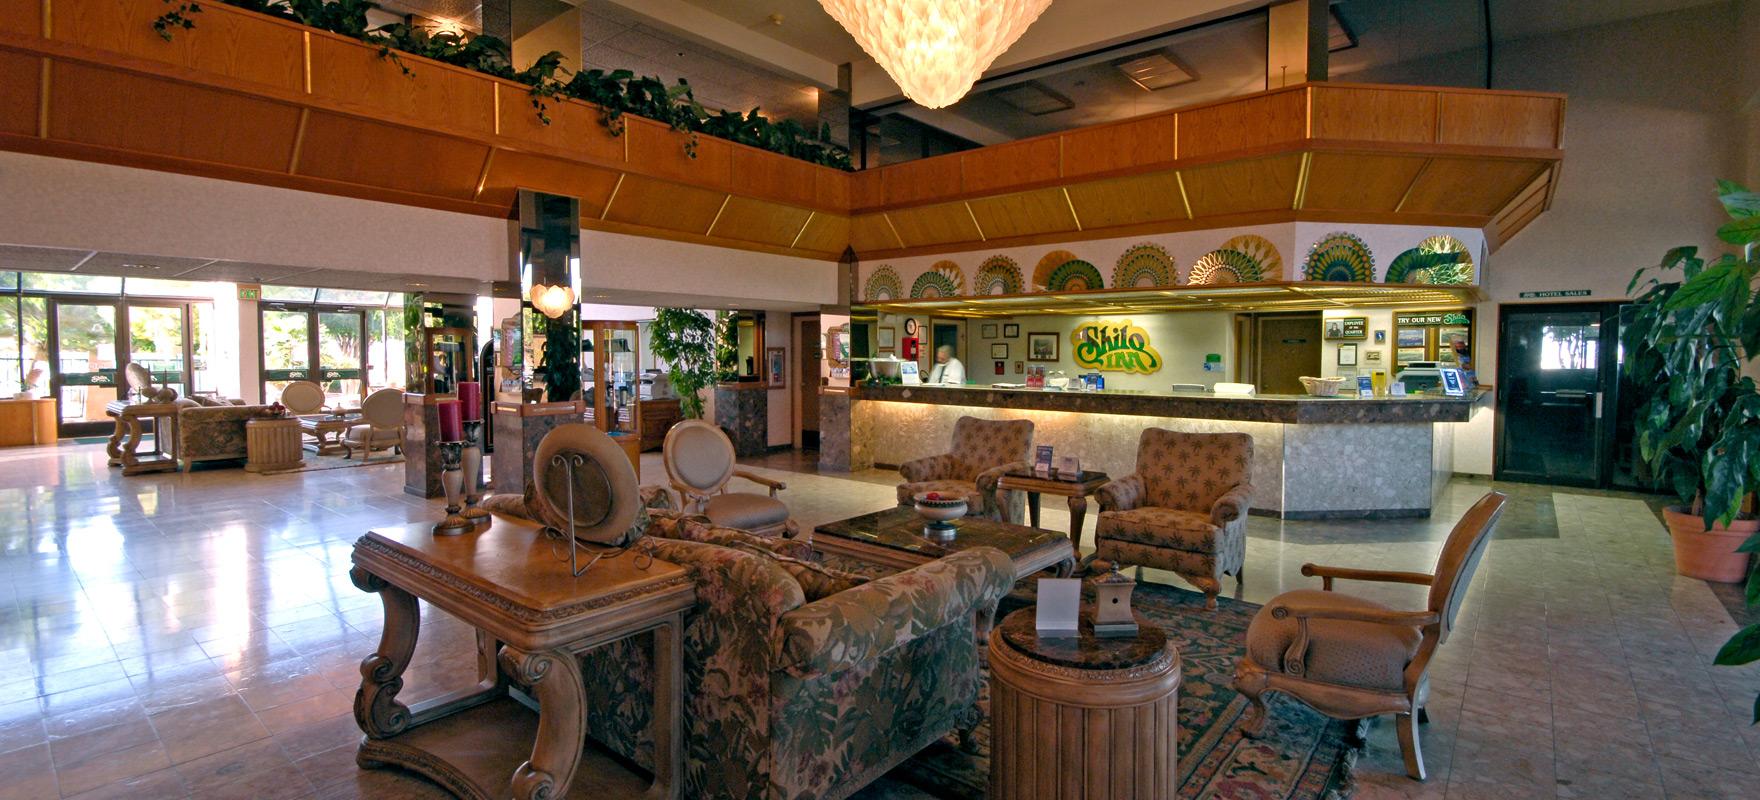 Shilo Inns Suites Hotels Yuma Arizona